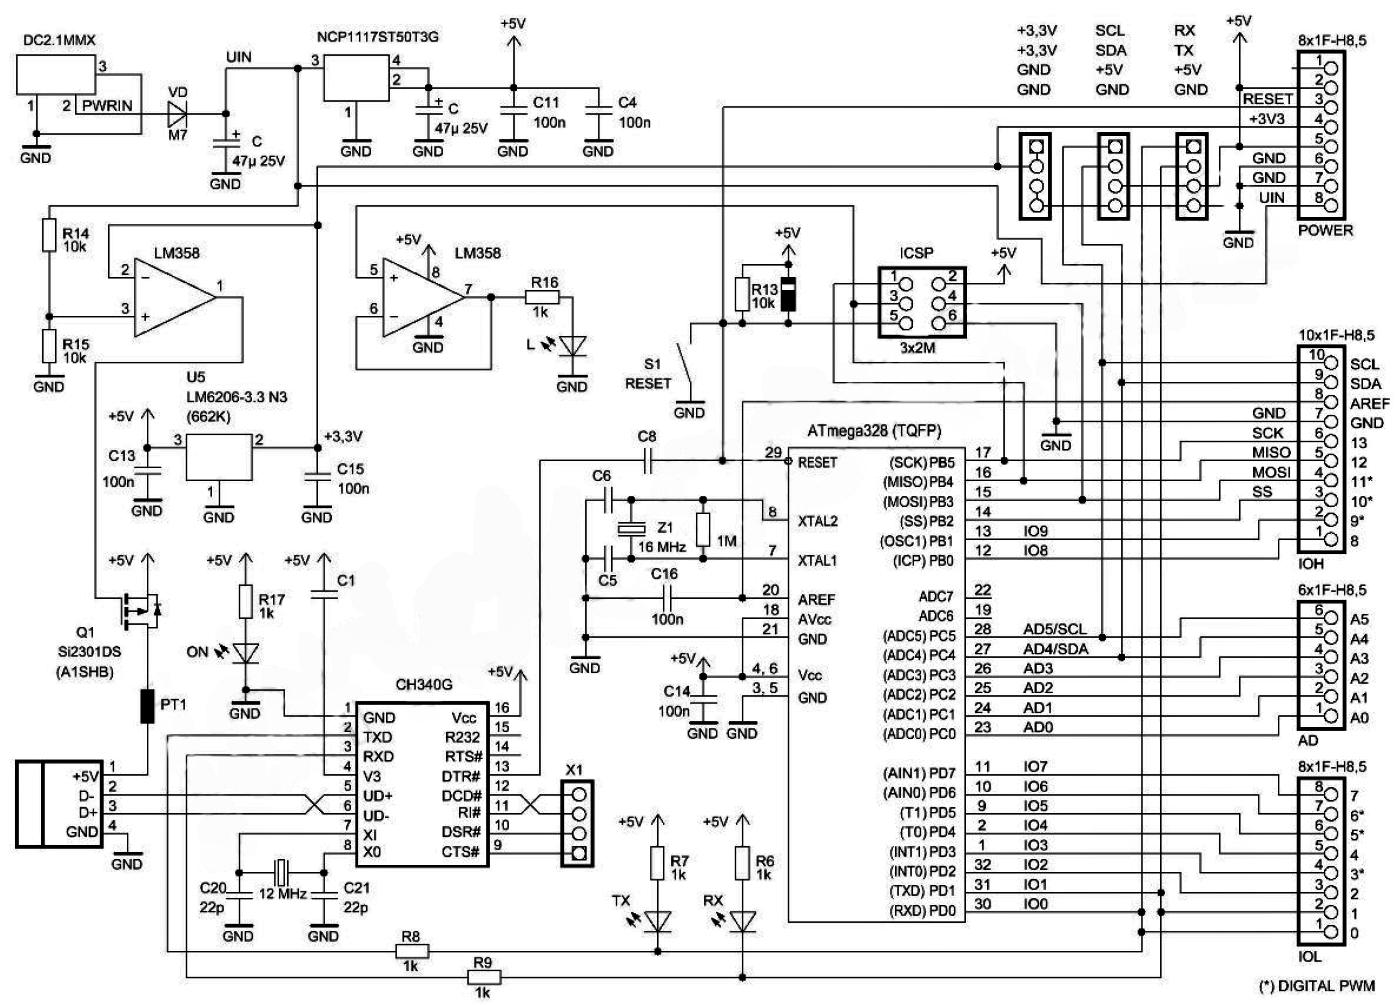 Arduino Uno Rev3/R3 - описание платы, драйвера - MicroPi